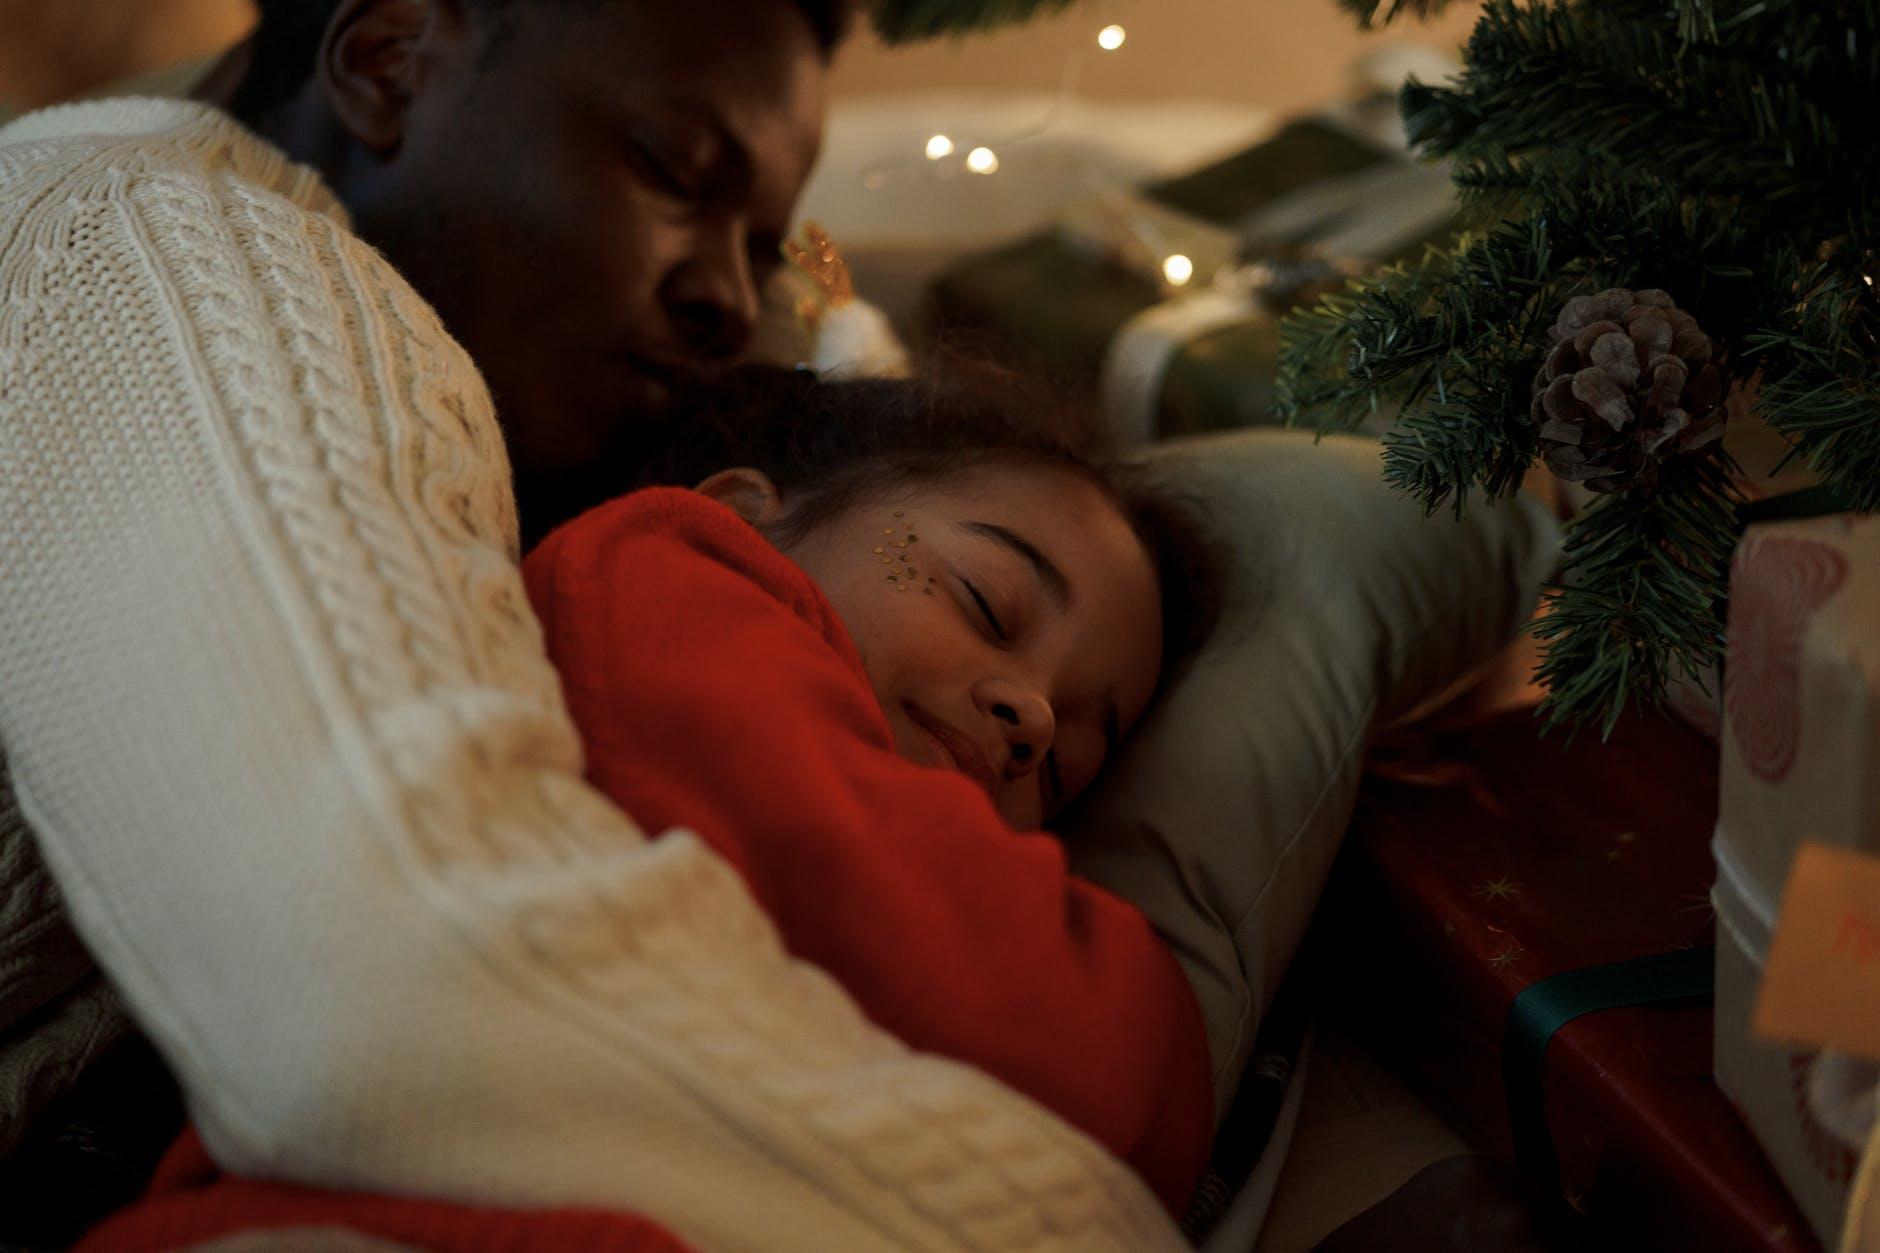 dad embracing her daughter while sleeping